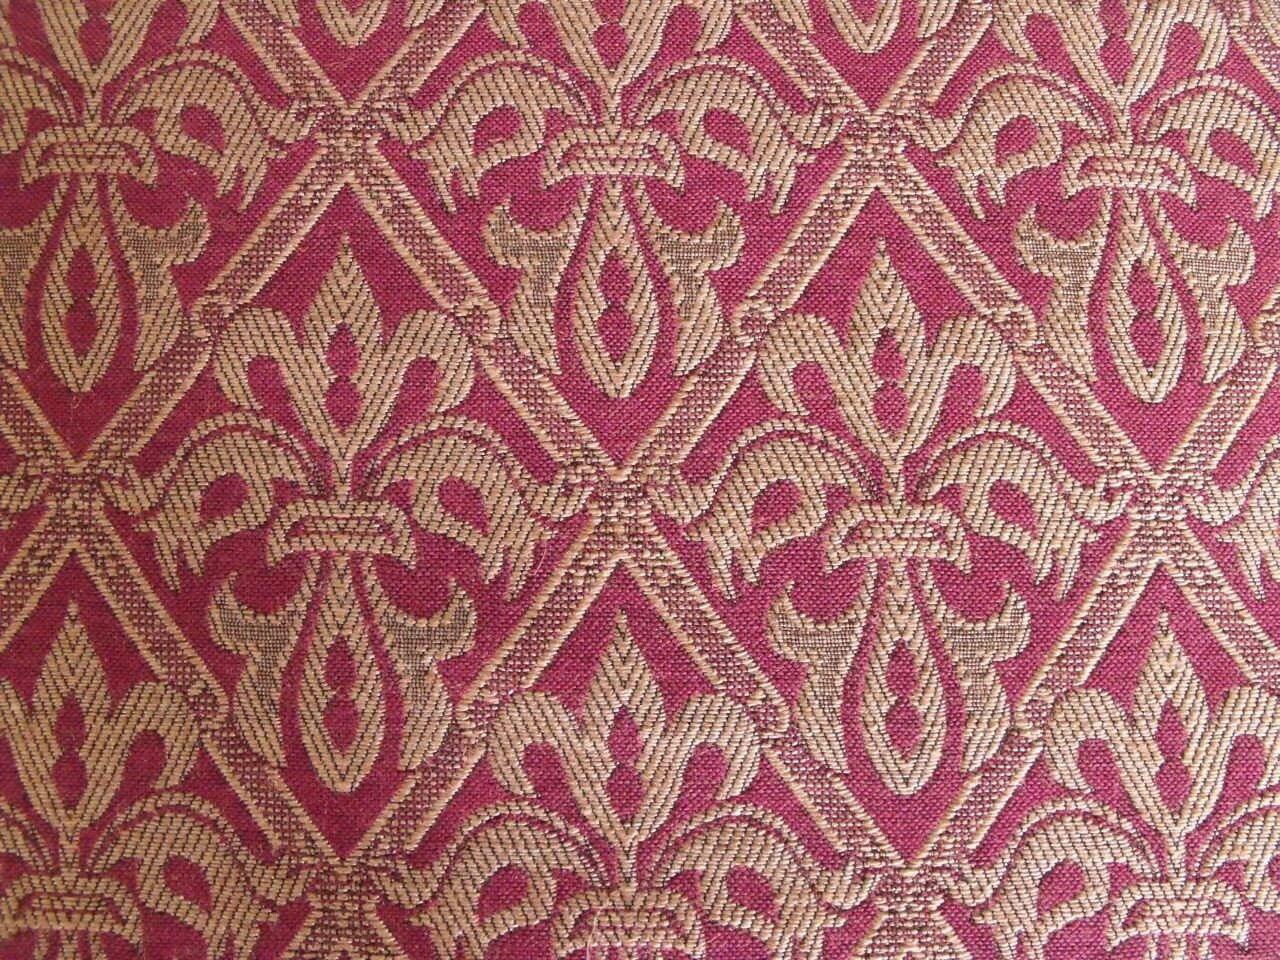 Tissu d 39 ameublement rouge ou bleu lee jofa anglais fleur - Tissus d ameublement anglais ...